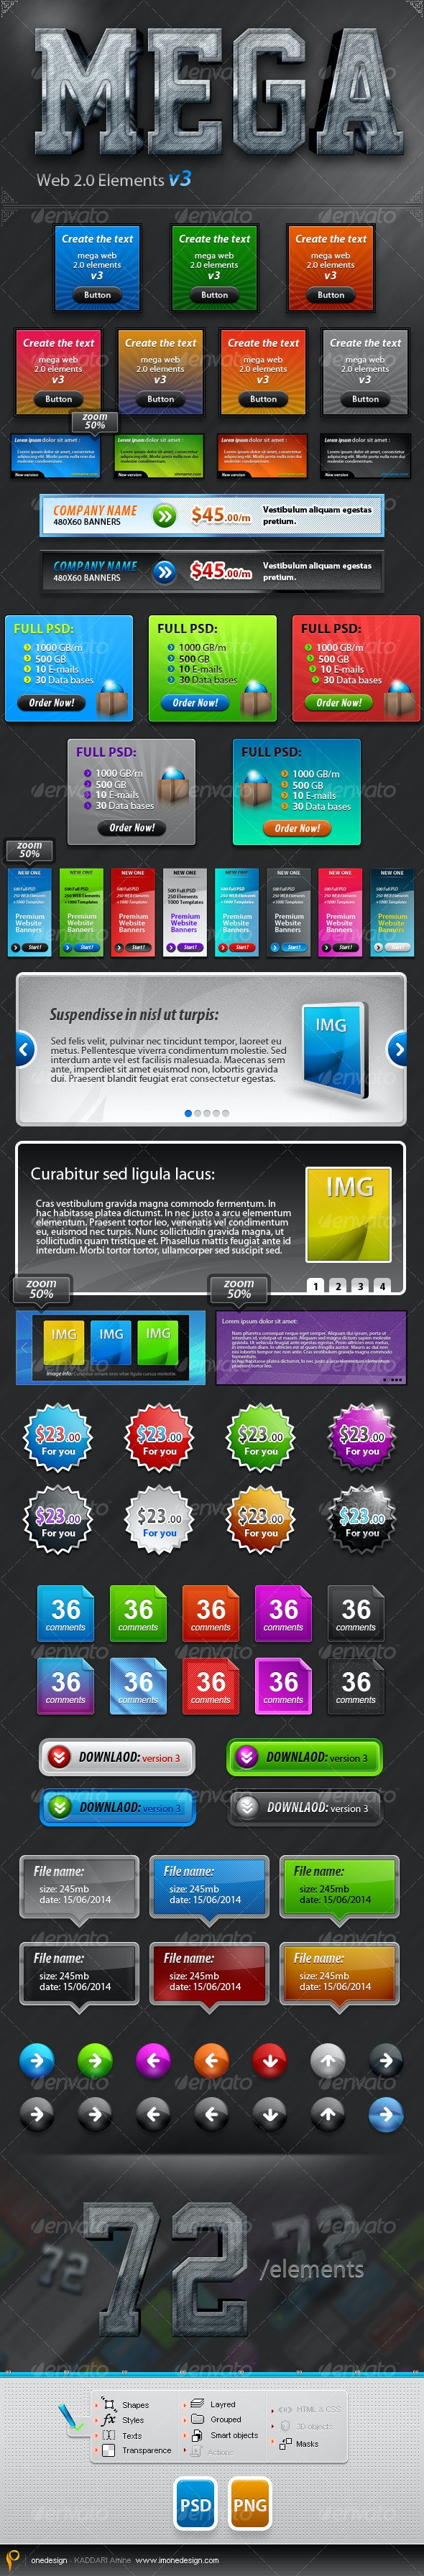 Big Web 2.0 Elements v3 Banners, Sliders, buttons - Miscellaneous Web Elements